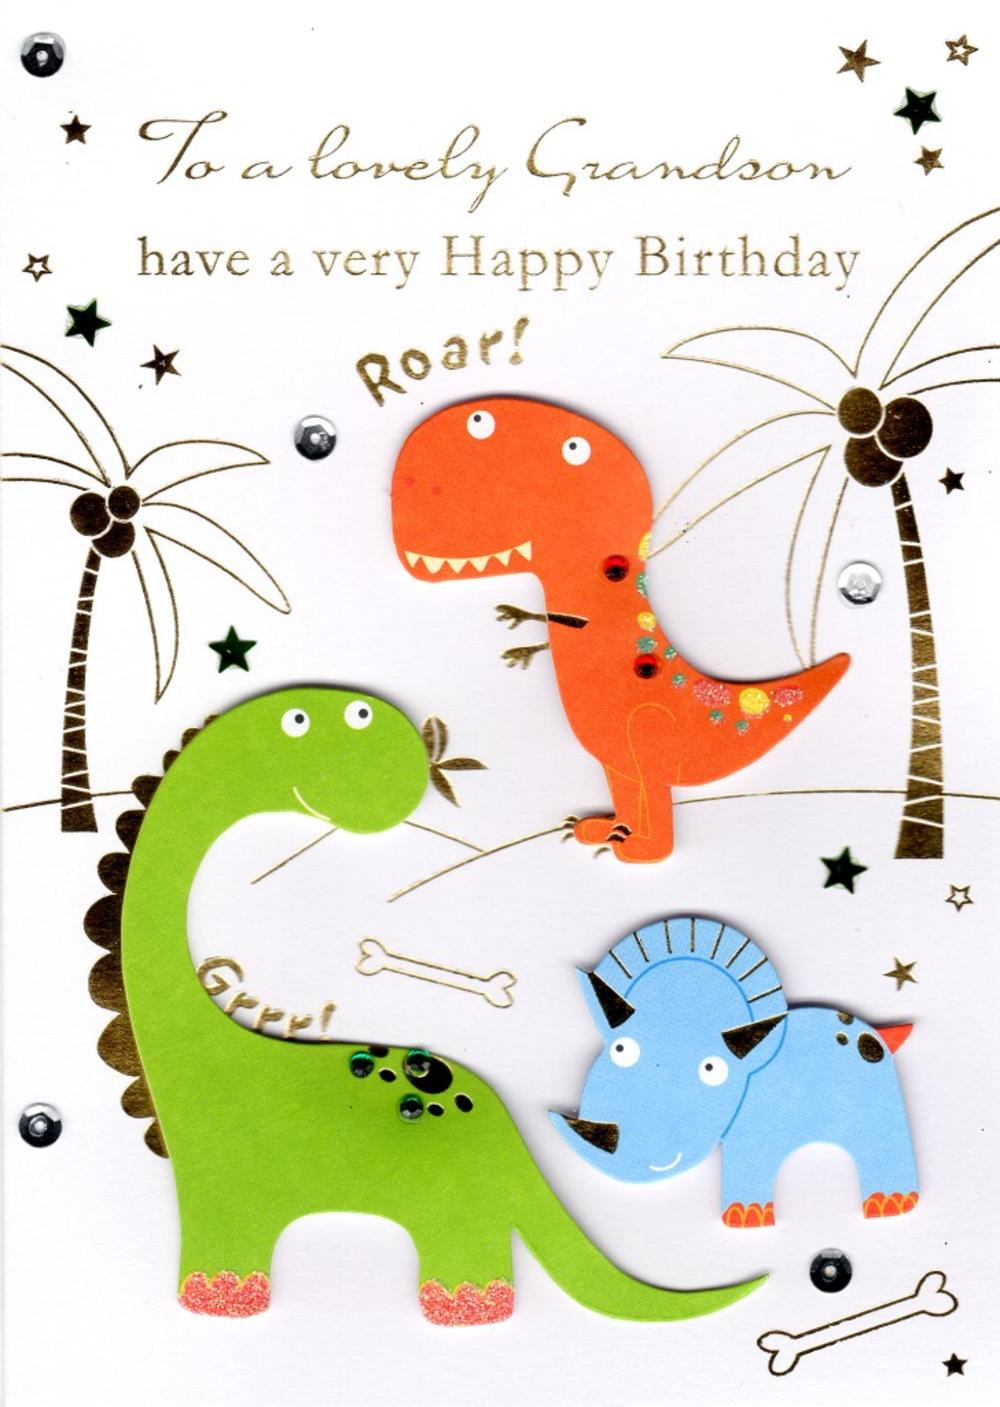 Lovely Grandson Handmade Birthday Greeting Card